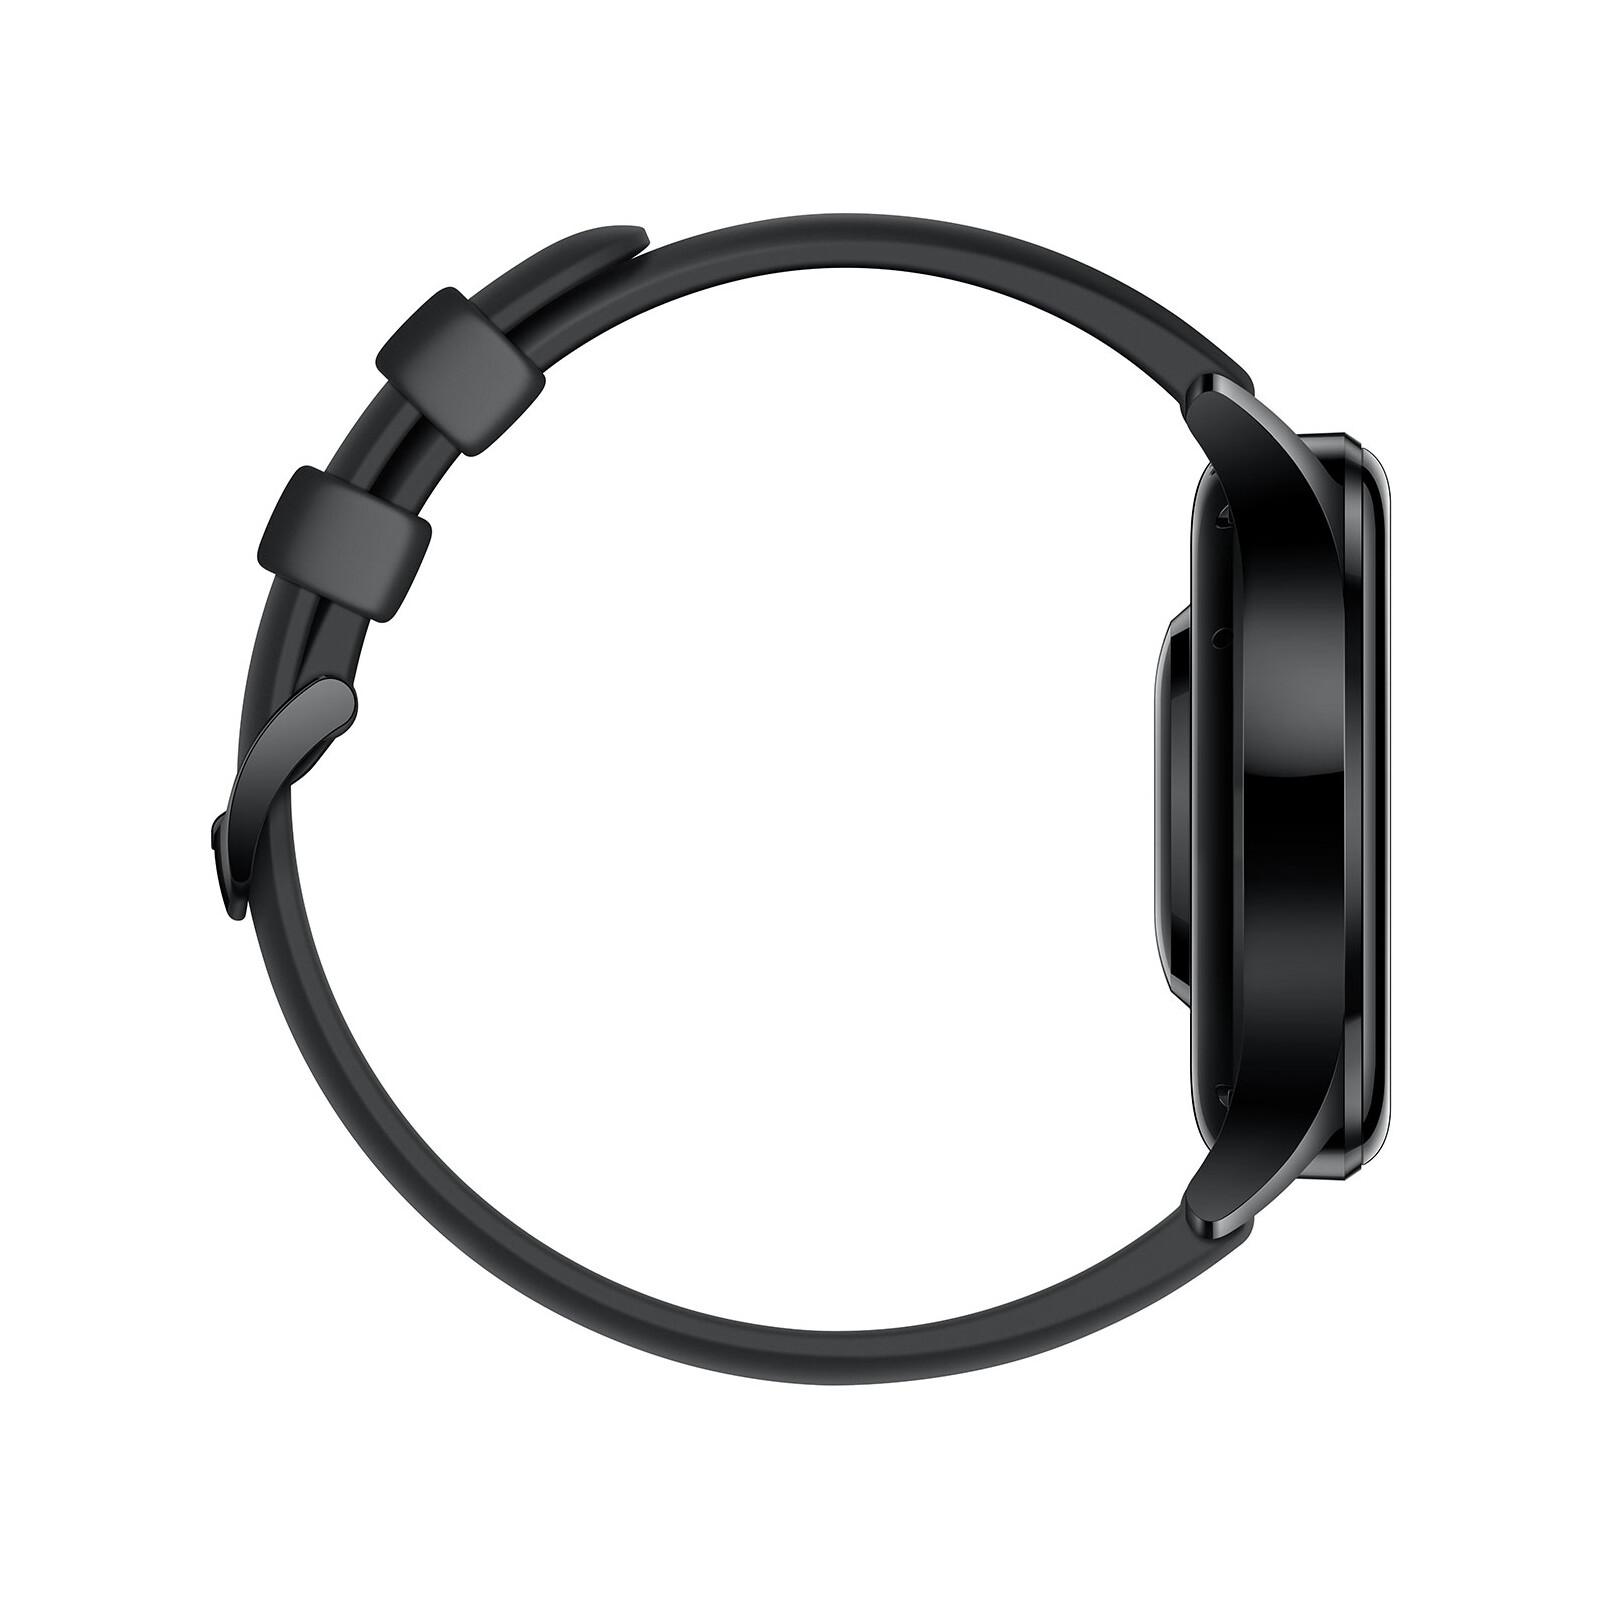 Huawei Watch 3 Active eSim 46mm Silikon schwarz/black steel